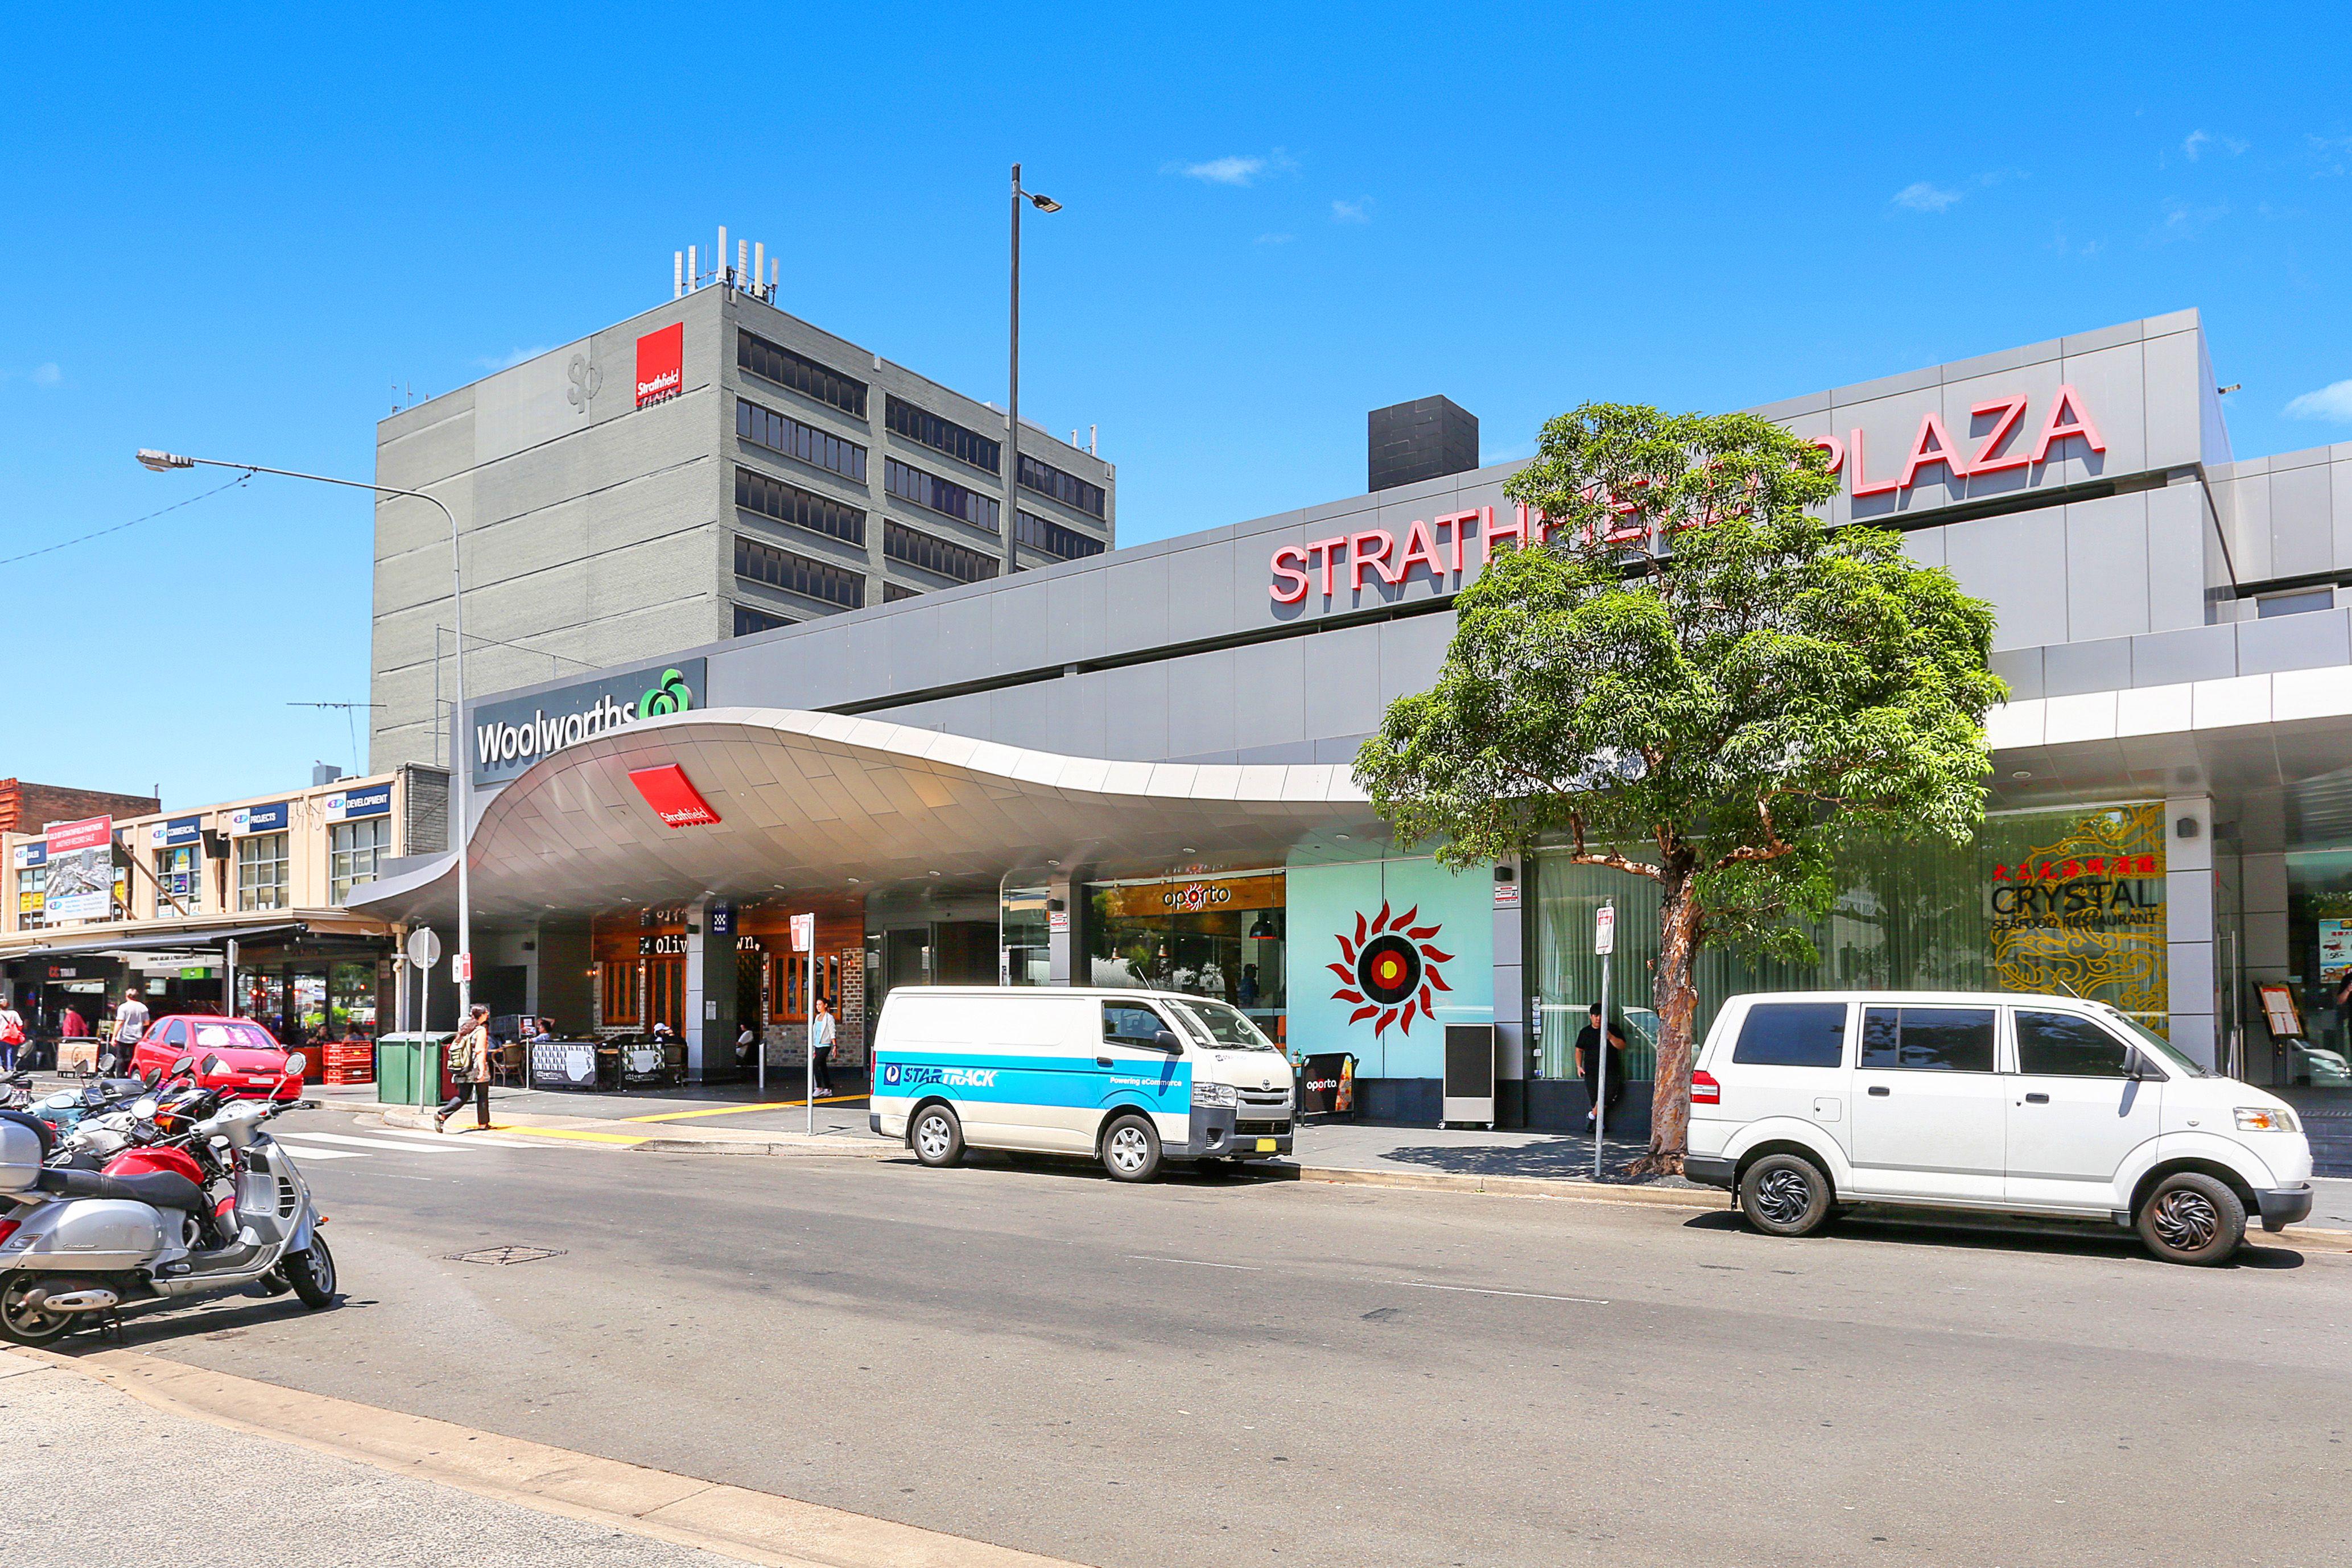 22/88-92 Albert Road, Strathfield NSW 2135